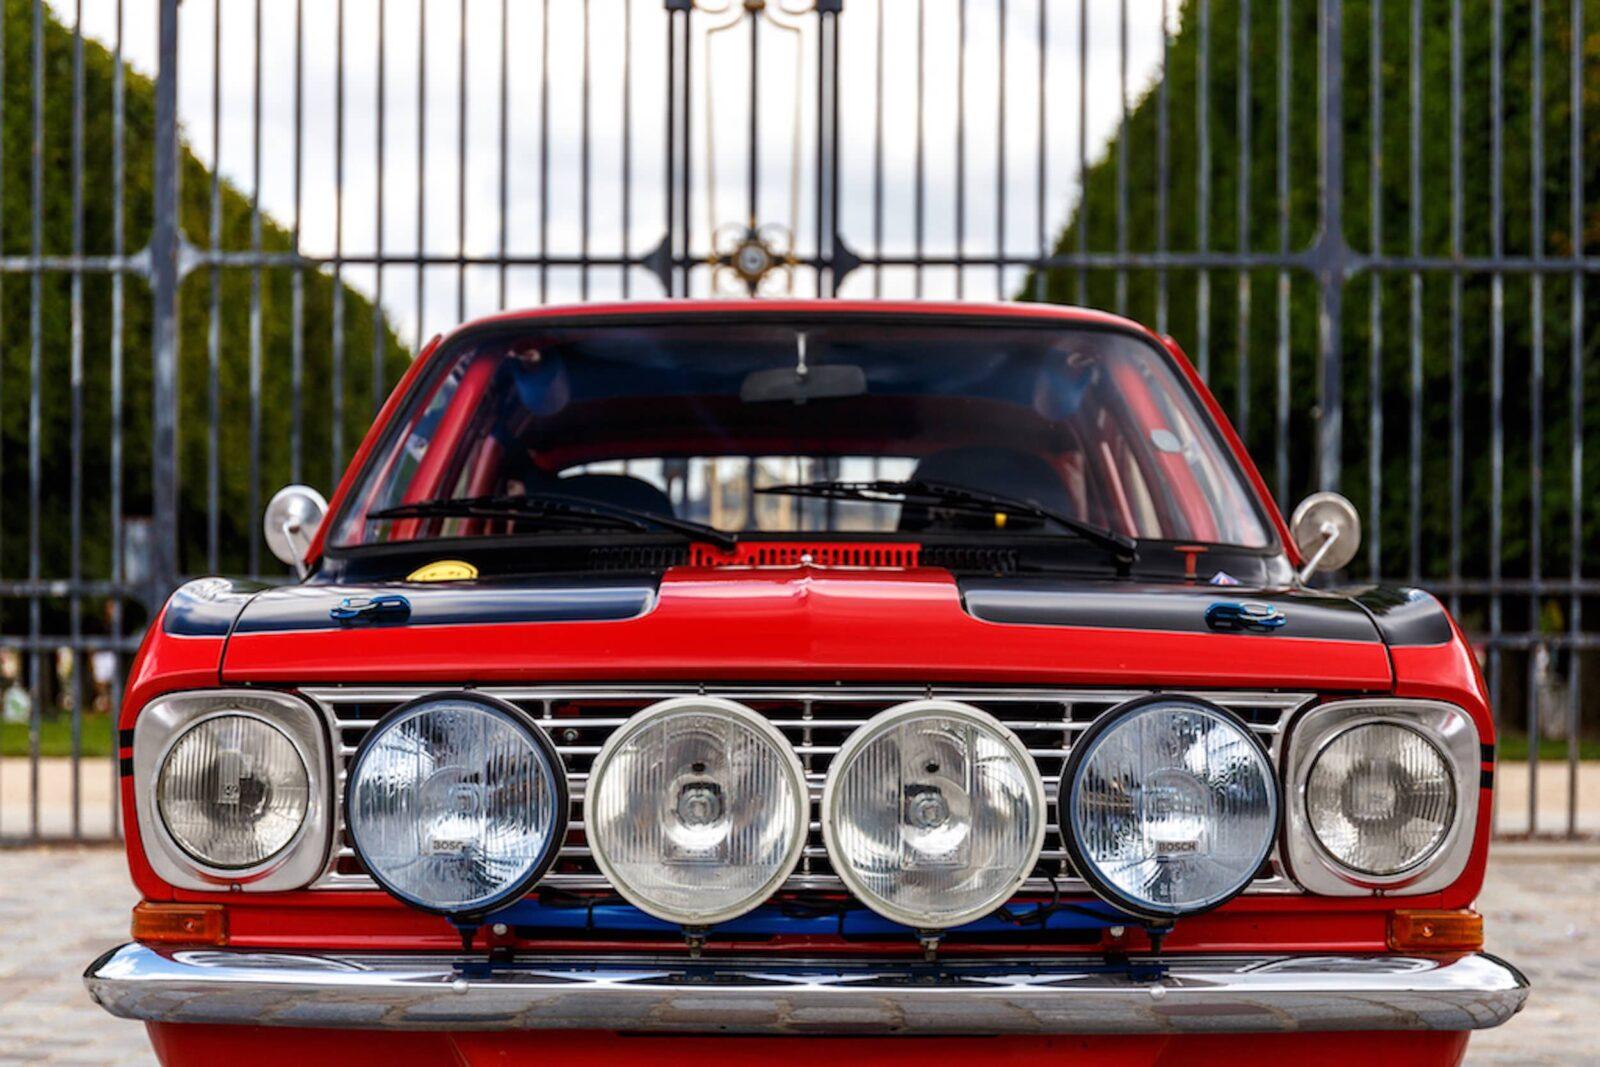 opel kadett rallye car 5 1600x1067 - 1969 Opel Rallye Kadett